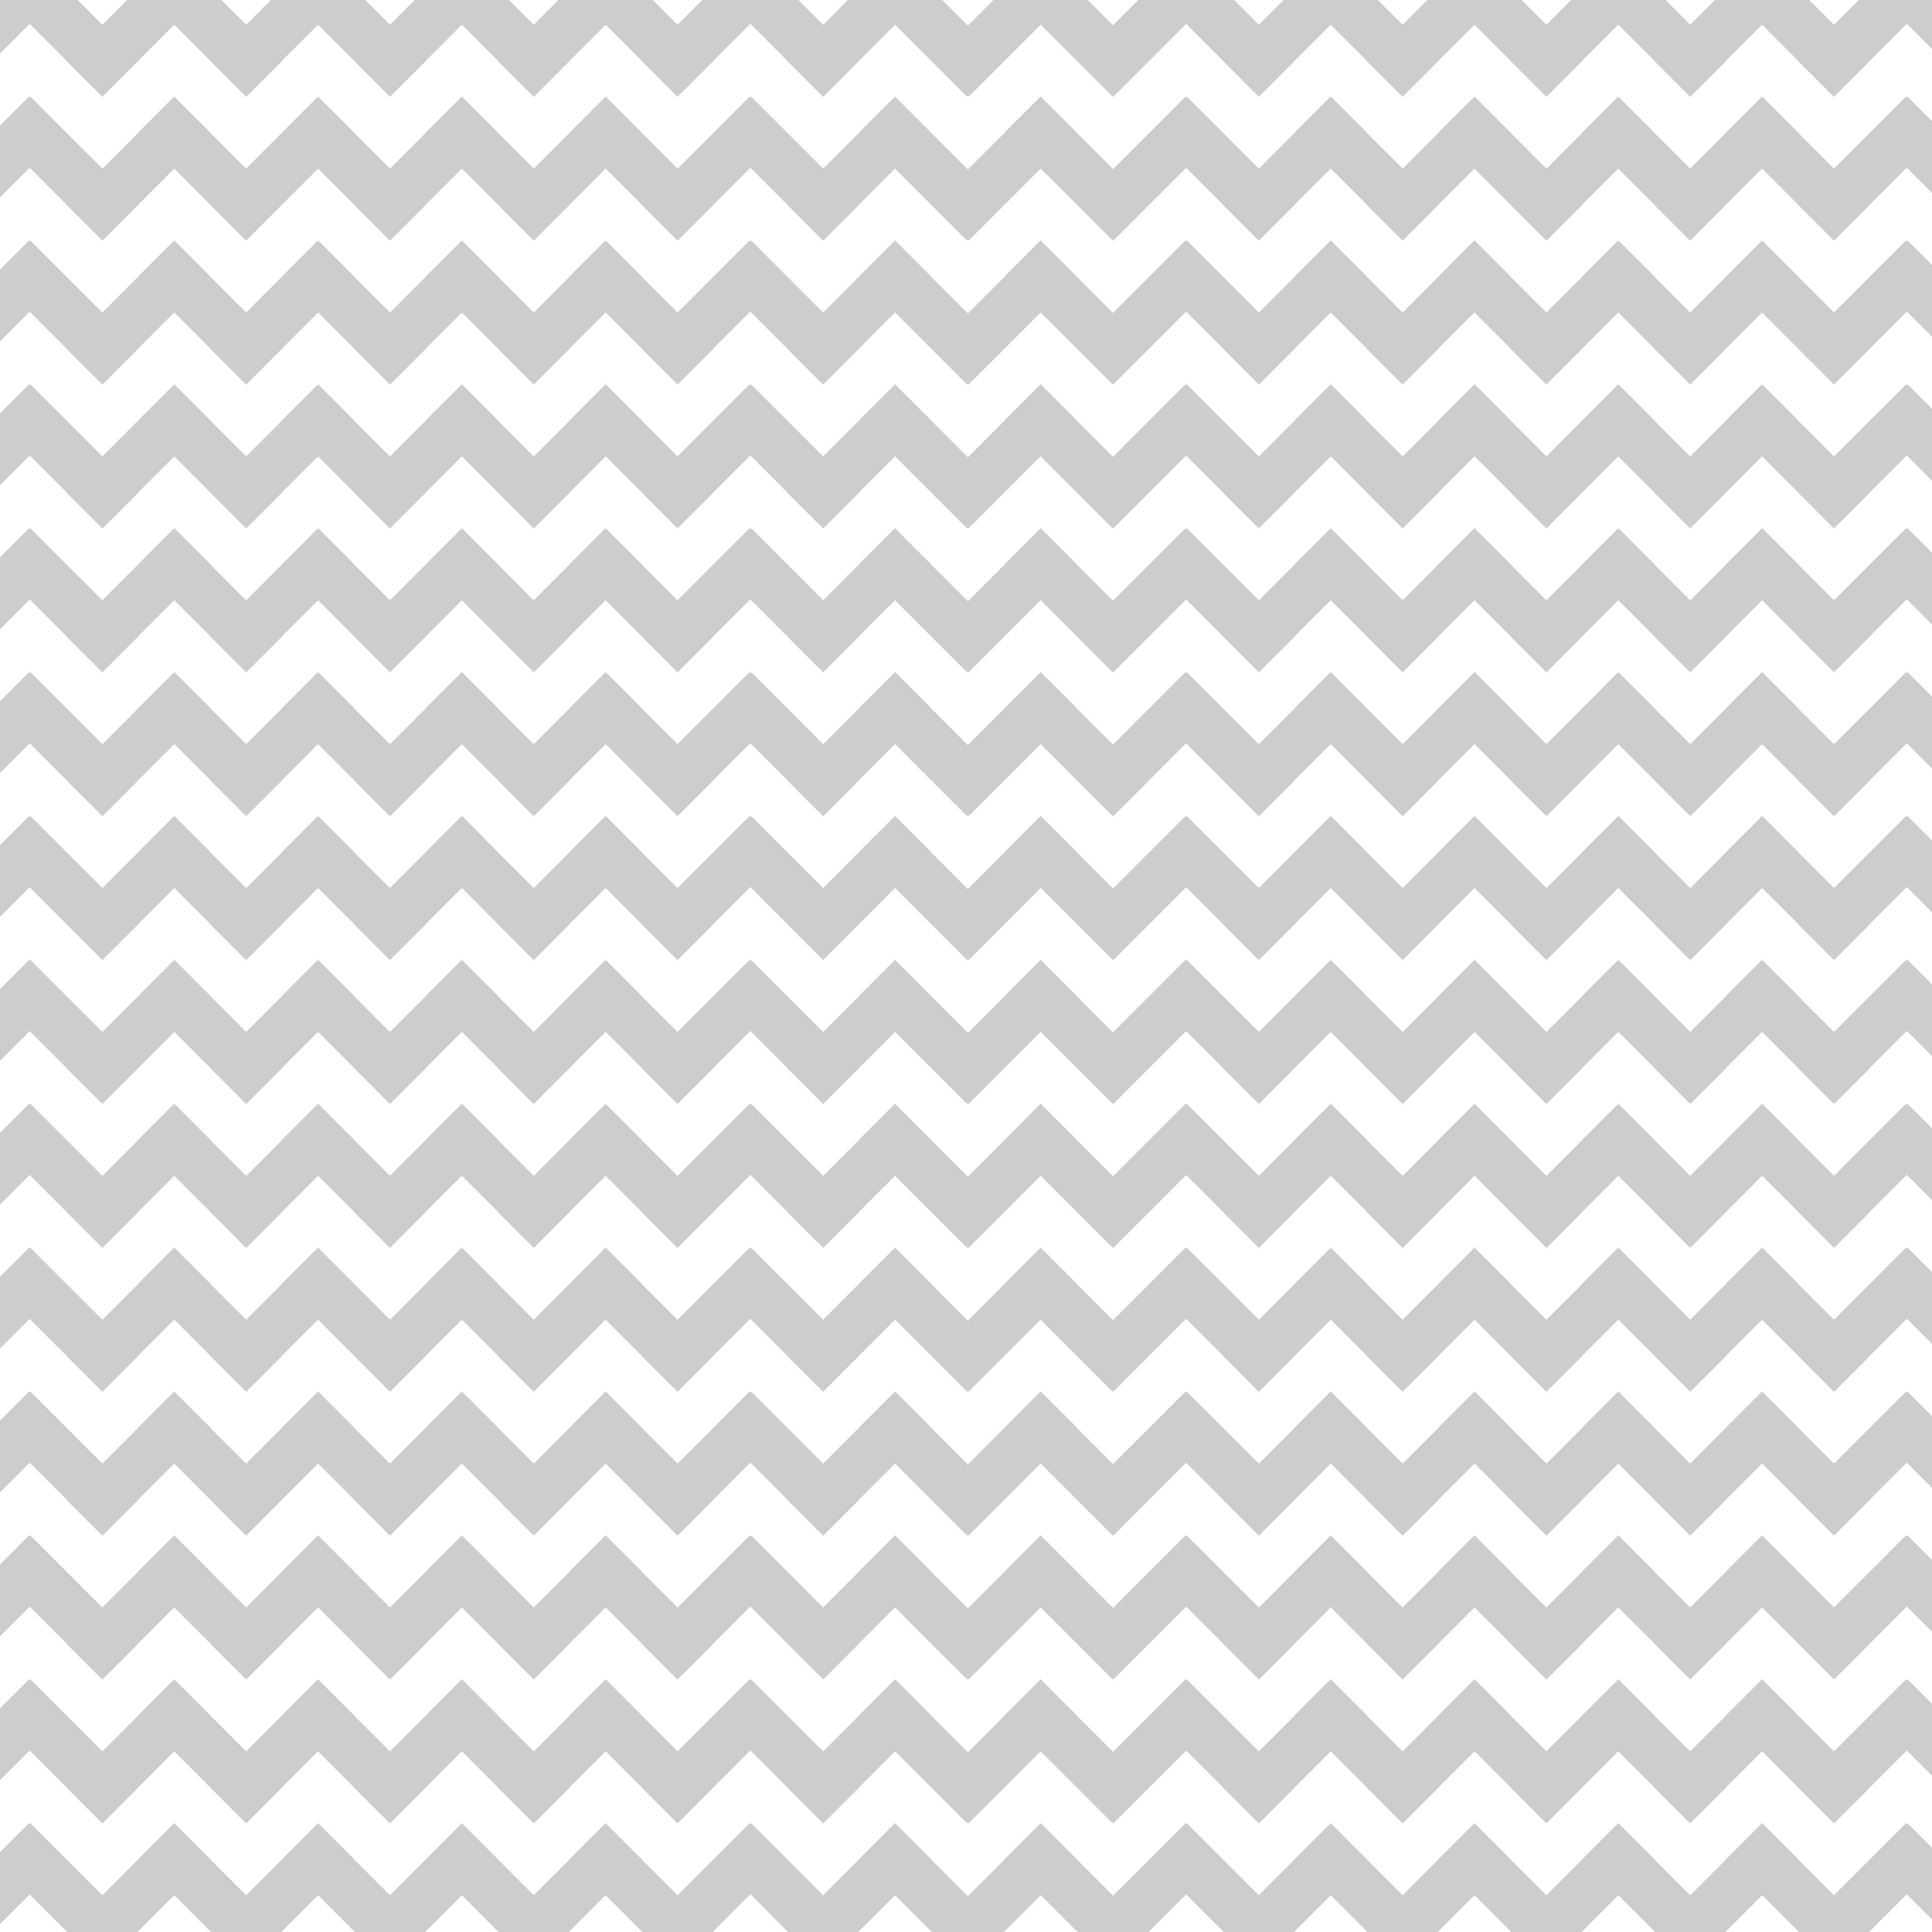 Printable Wallpaper: Free Printable Wallpaper Designs